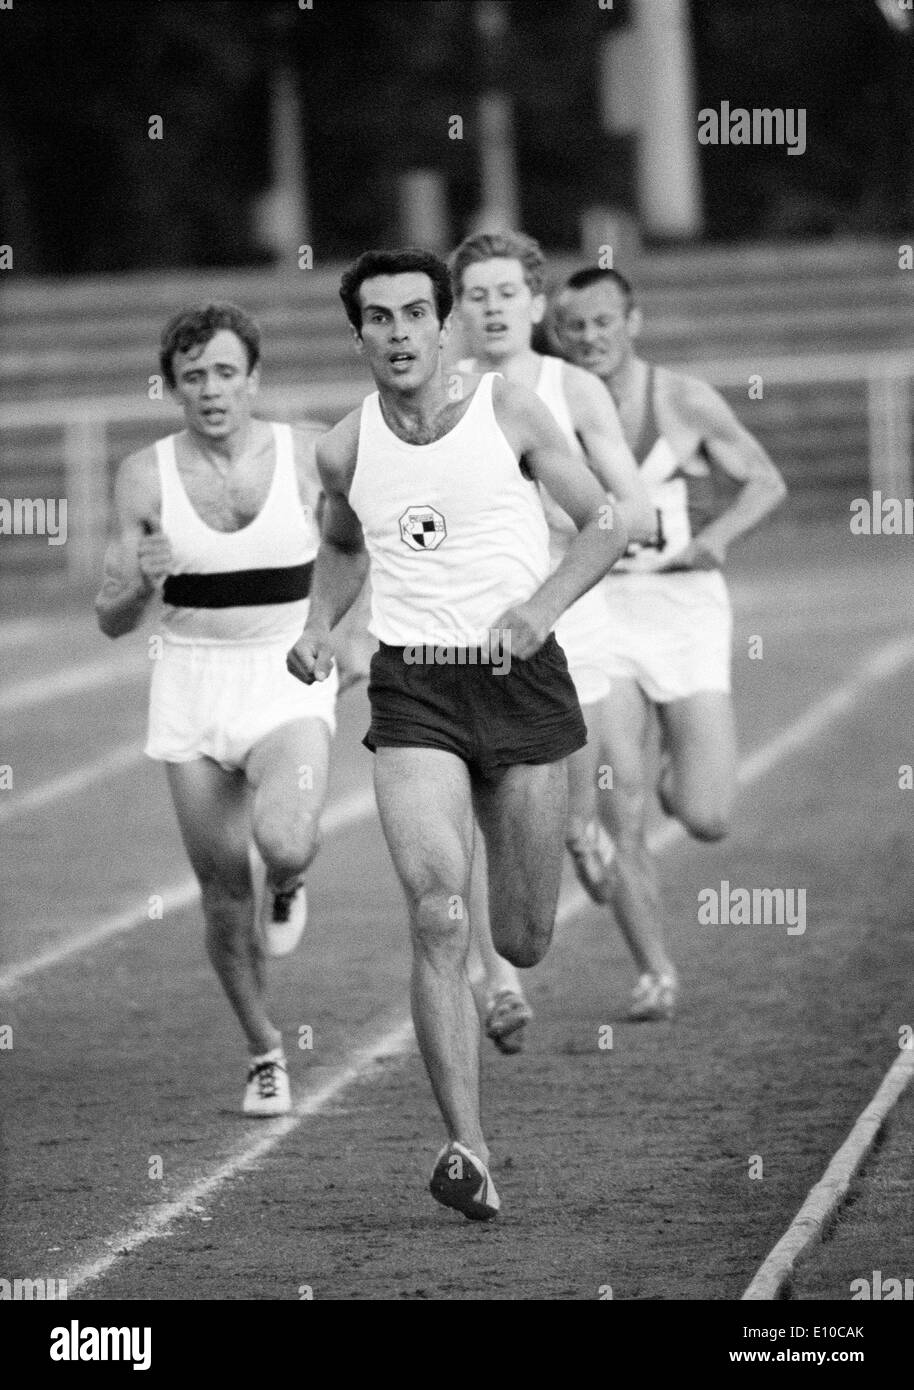 Sixties, black and white photo, sports, athletics, International Meeting in Athletics 1966 in Krefeld-Uerdingen, track racing, long distance, men, ahead a runner of KTSV Preussen Krefeld 1855, D-Krefeld, D-Krefeld-Uerdingen, Lower Rhine, North Rhine-Westp - Stock Image